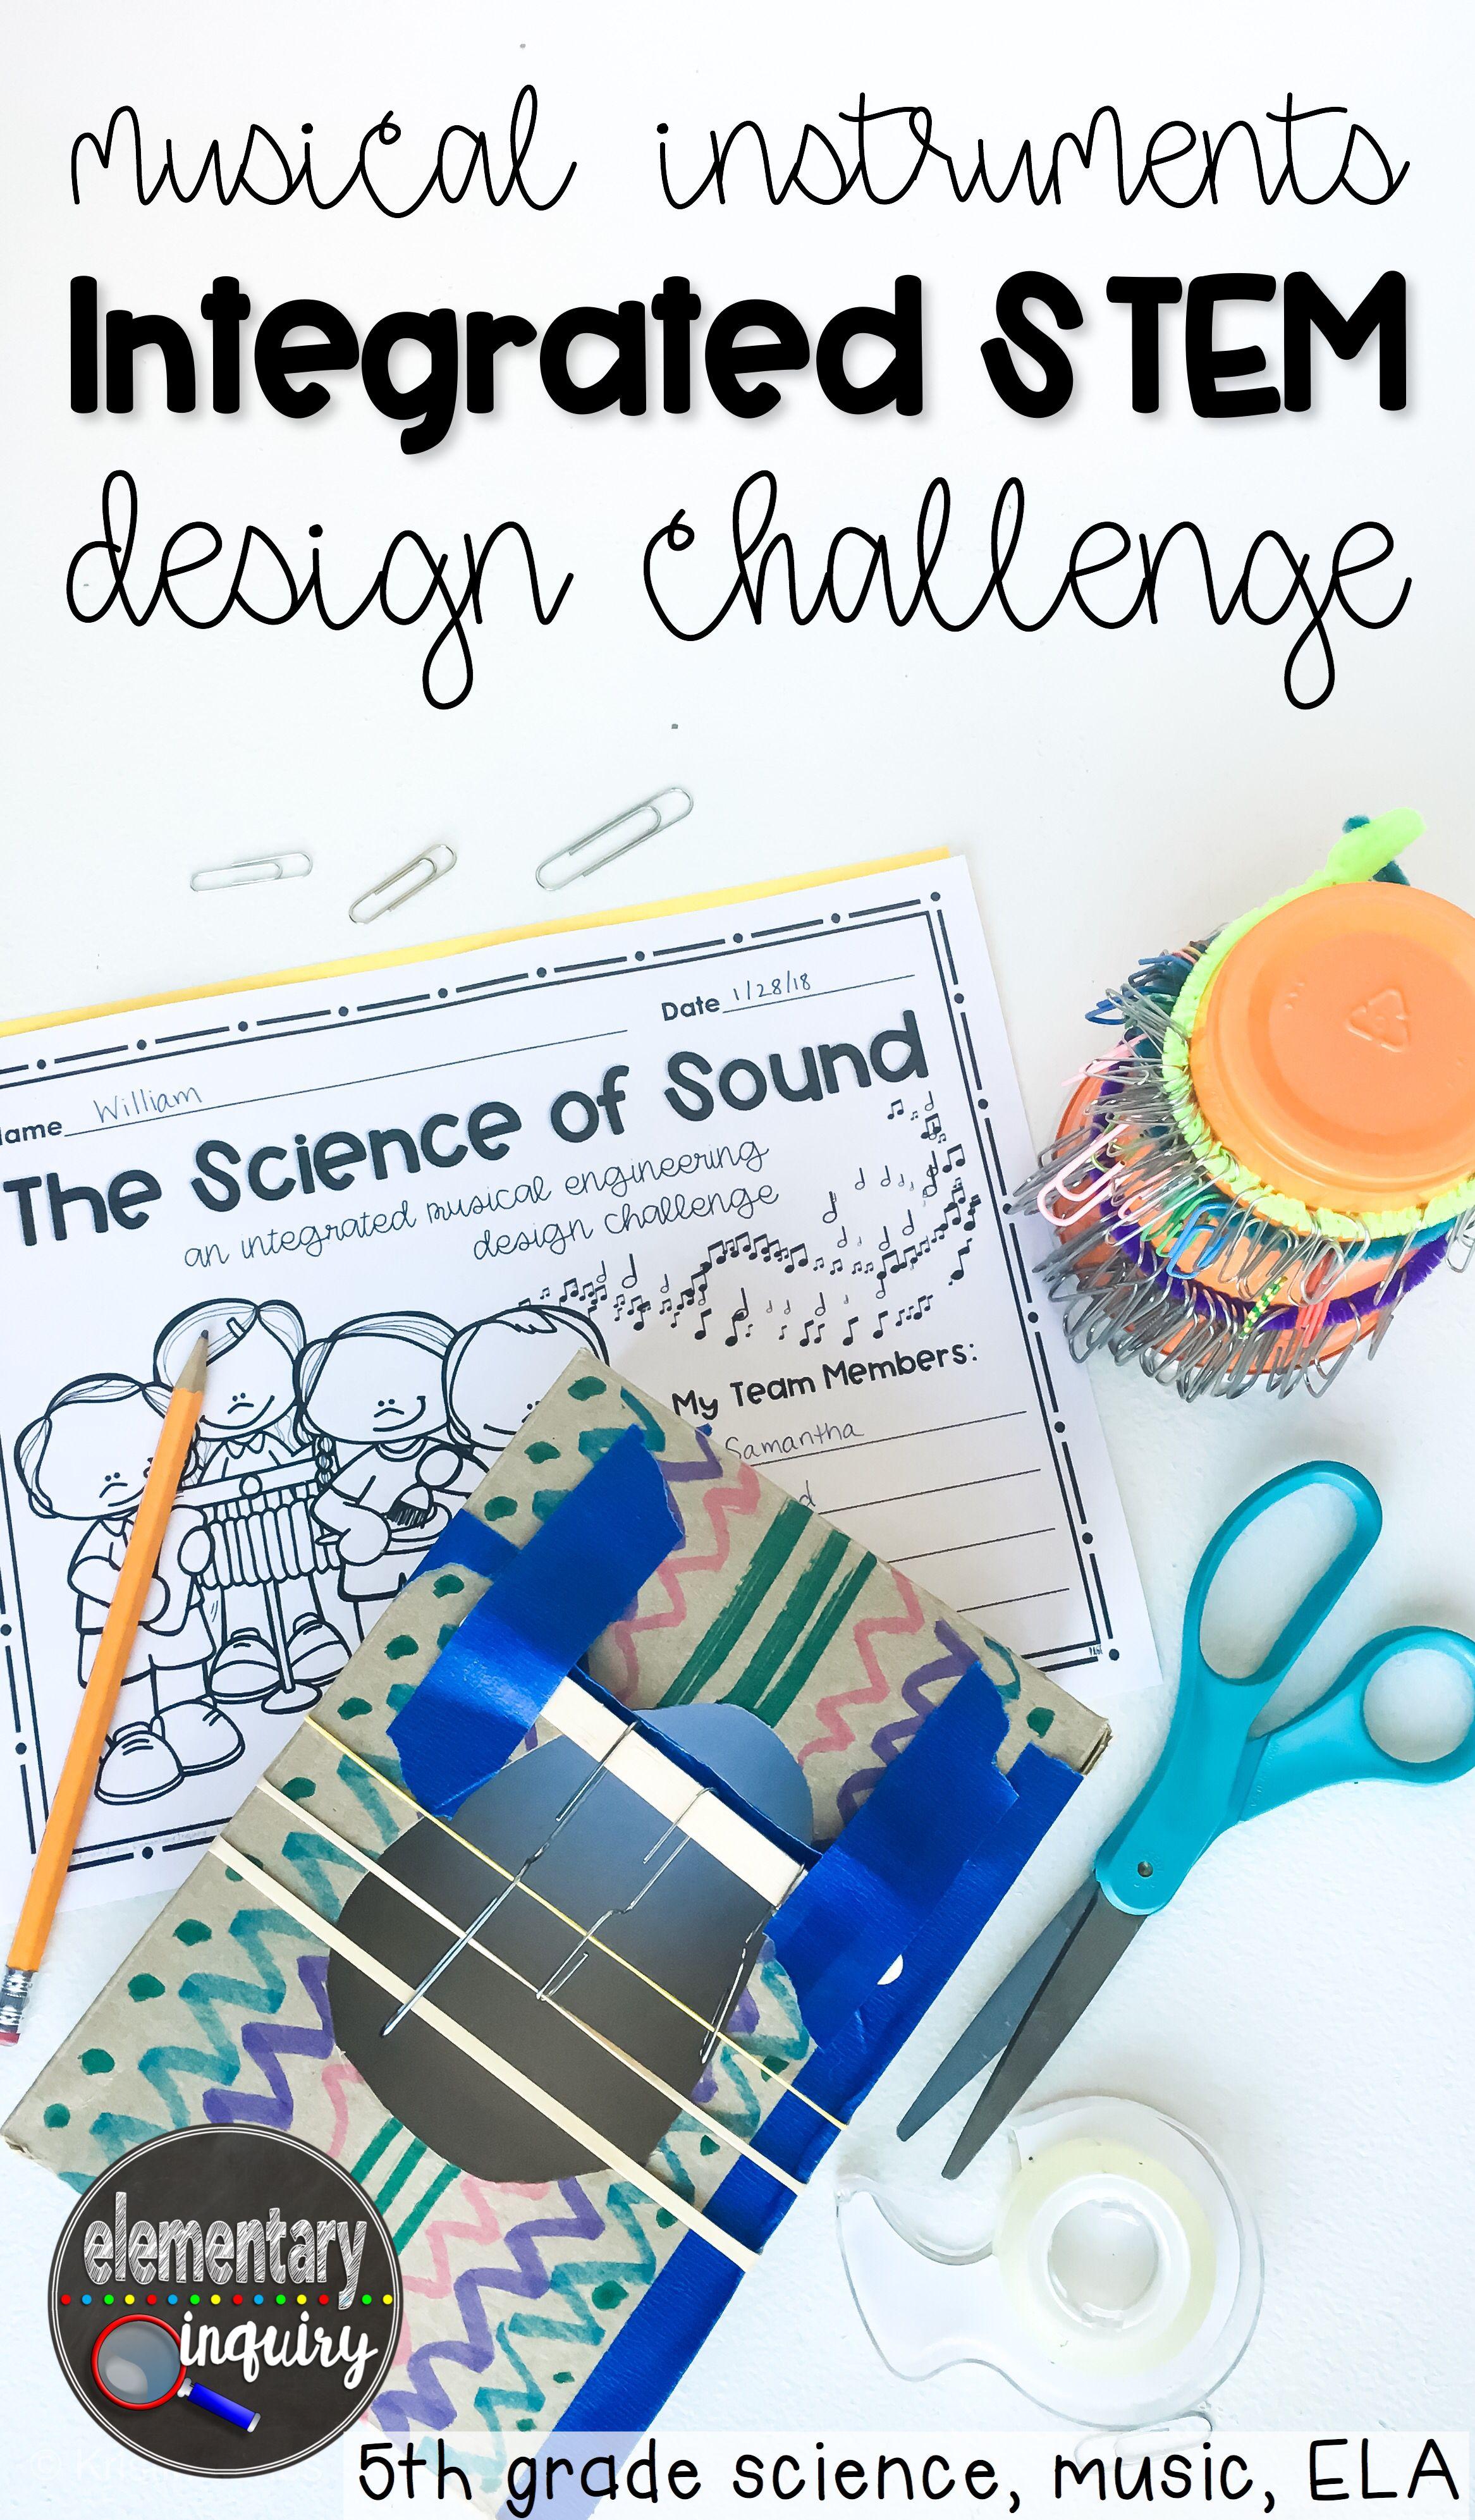 Science Of Sound Musical Instrument Steam Design